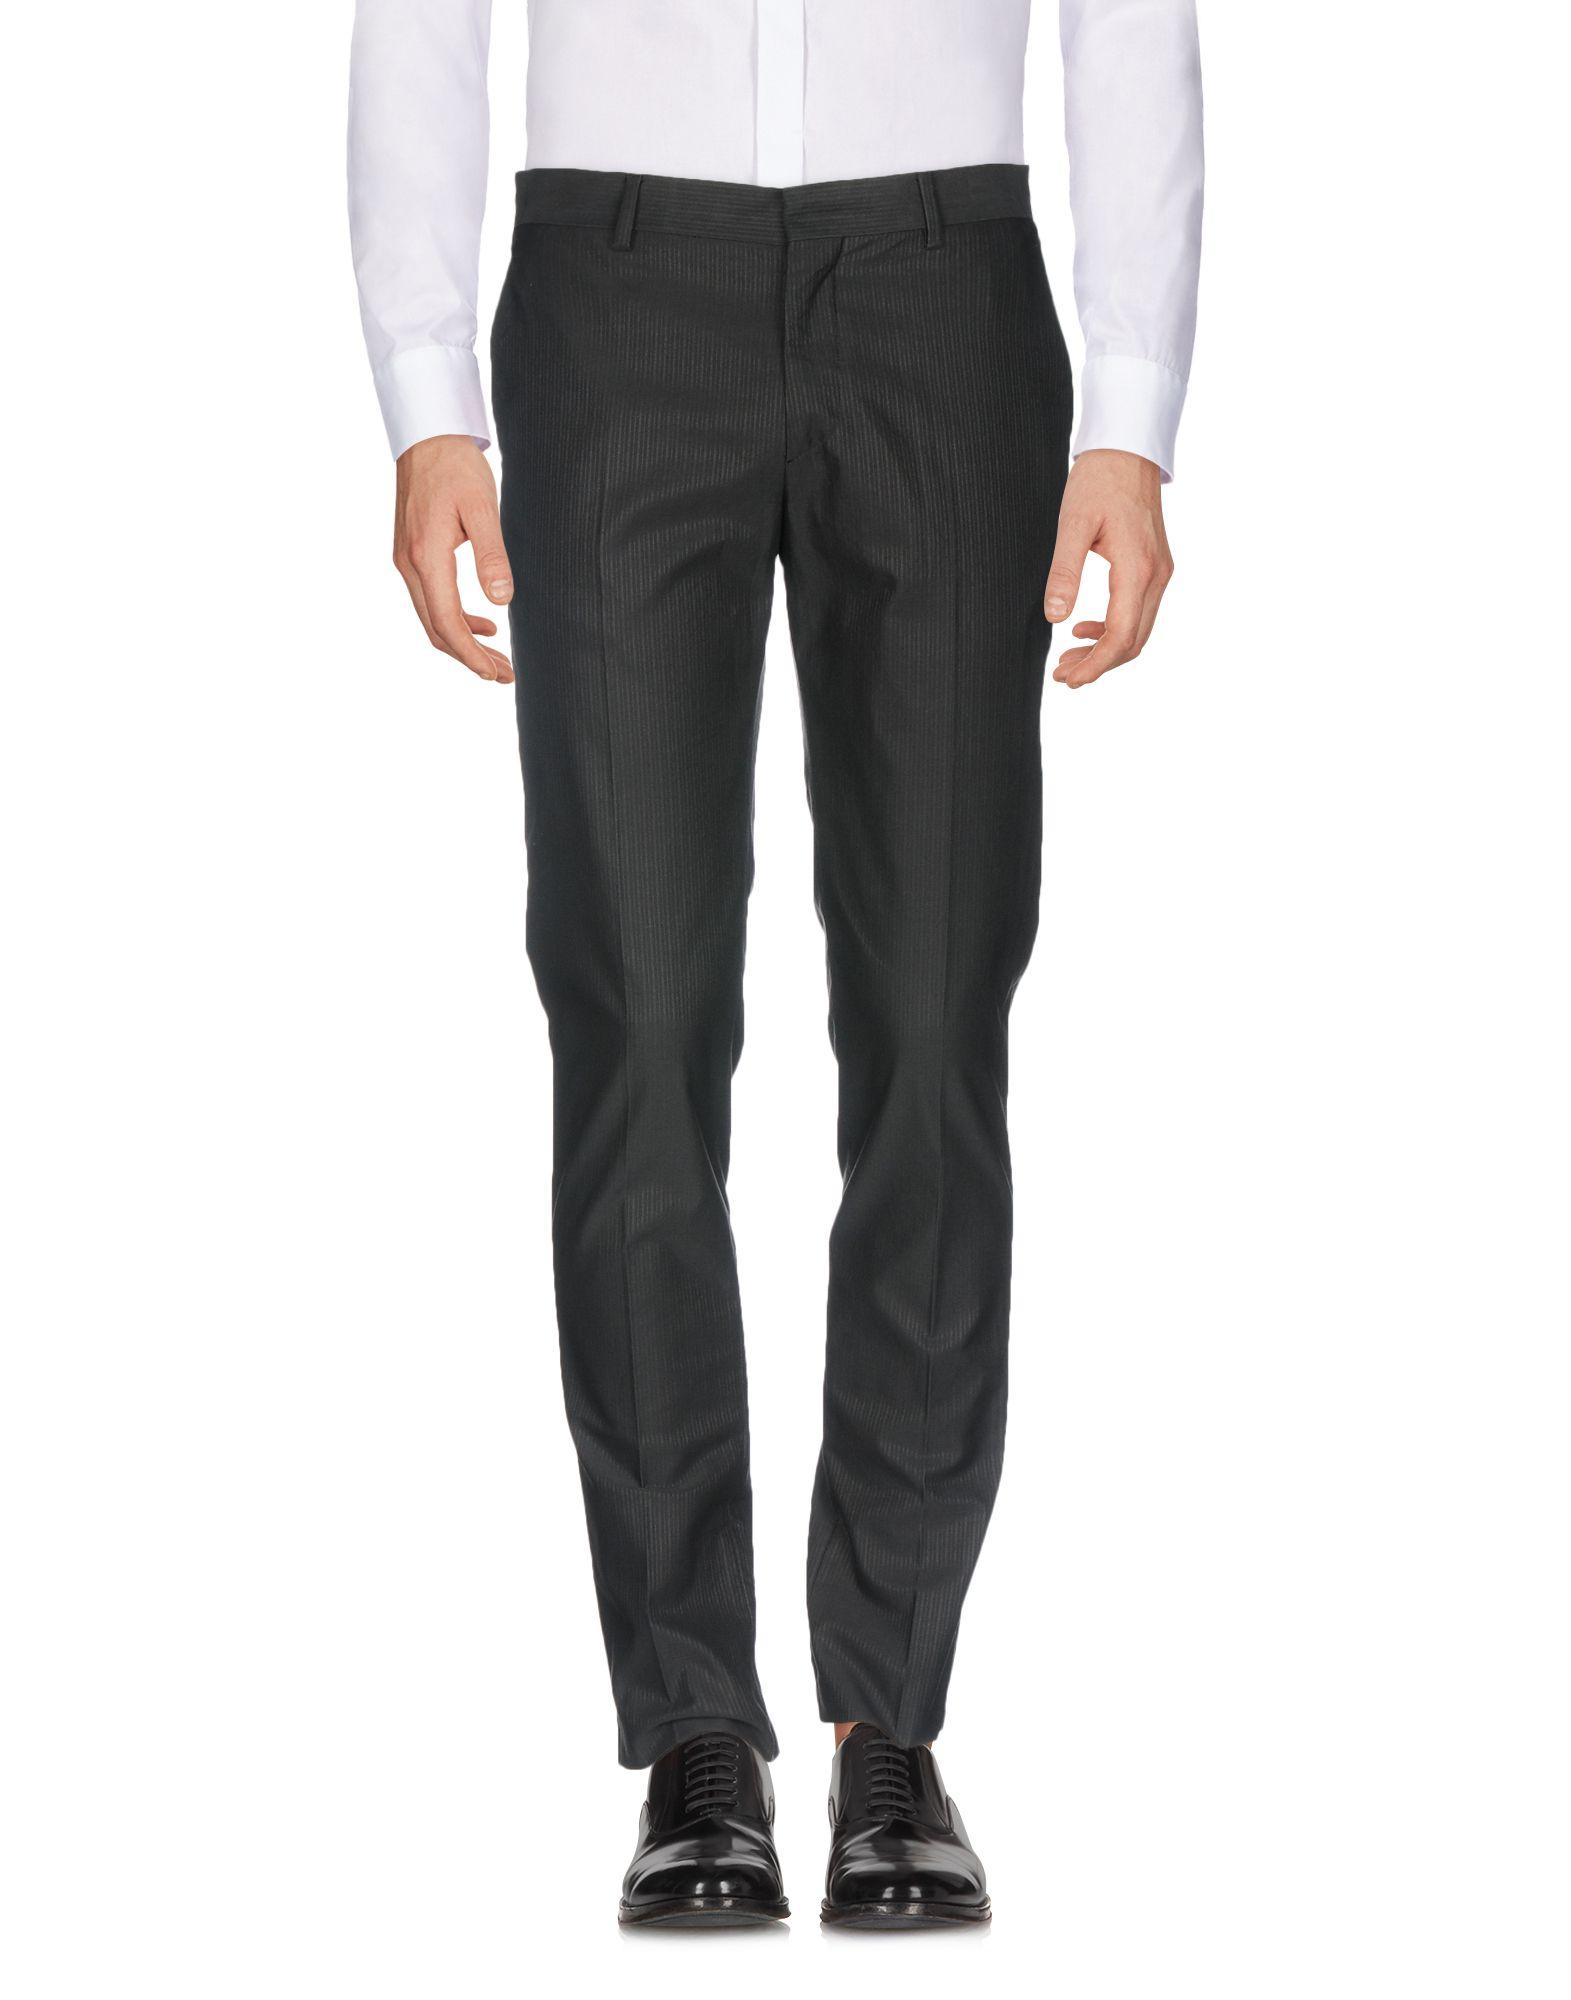 Pantalone Pantalone Pantalone Maison Margiela Uomo - 13162757WU 601abc